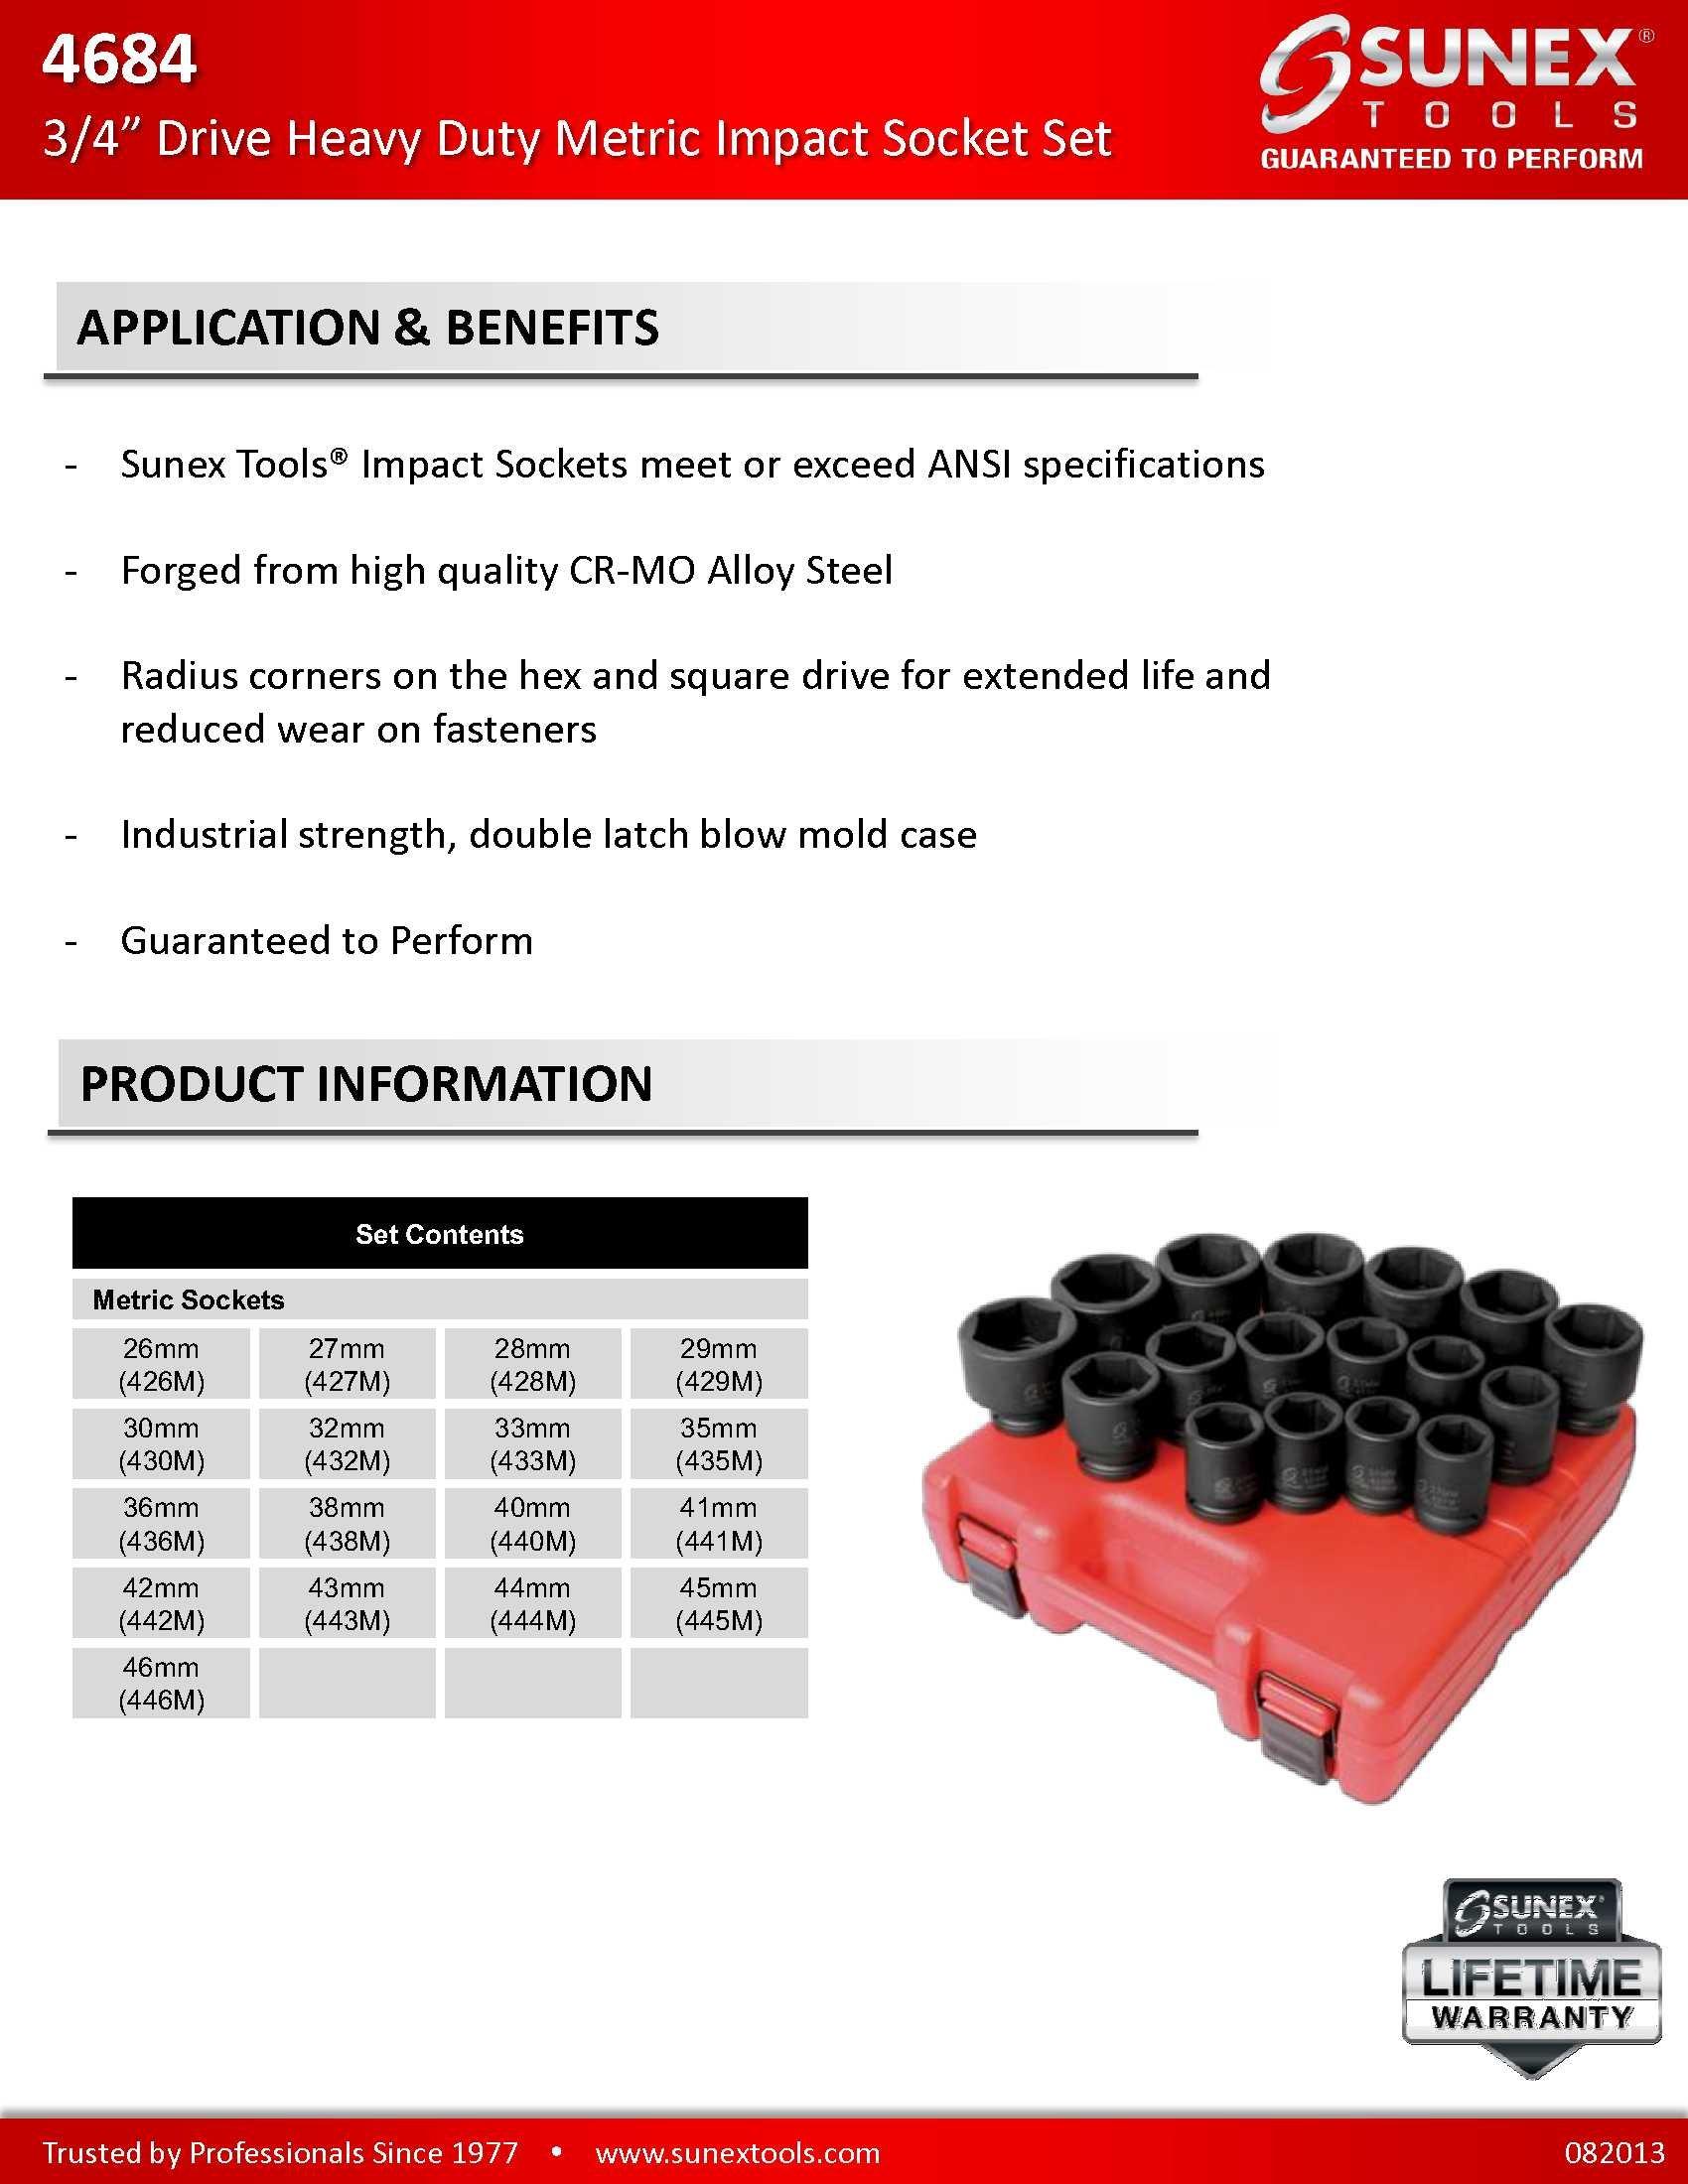 Sunex 4684 3/4-Inch Drive Heavy Duty Metric Impact Socket Set, Metric, Standard, 6-Point, Cr-Mo, 26mm - 46mm, 17-Piece